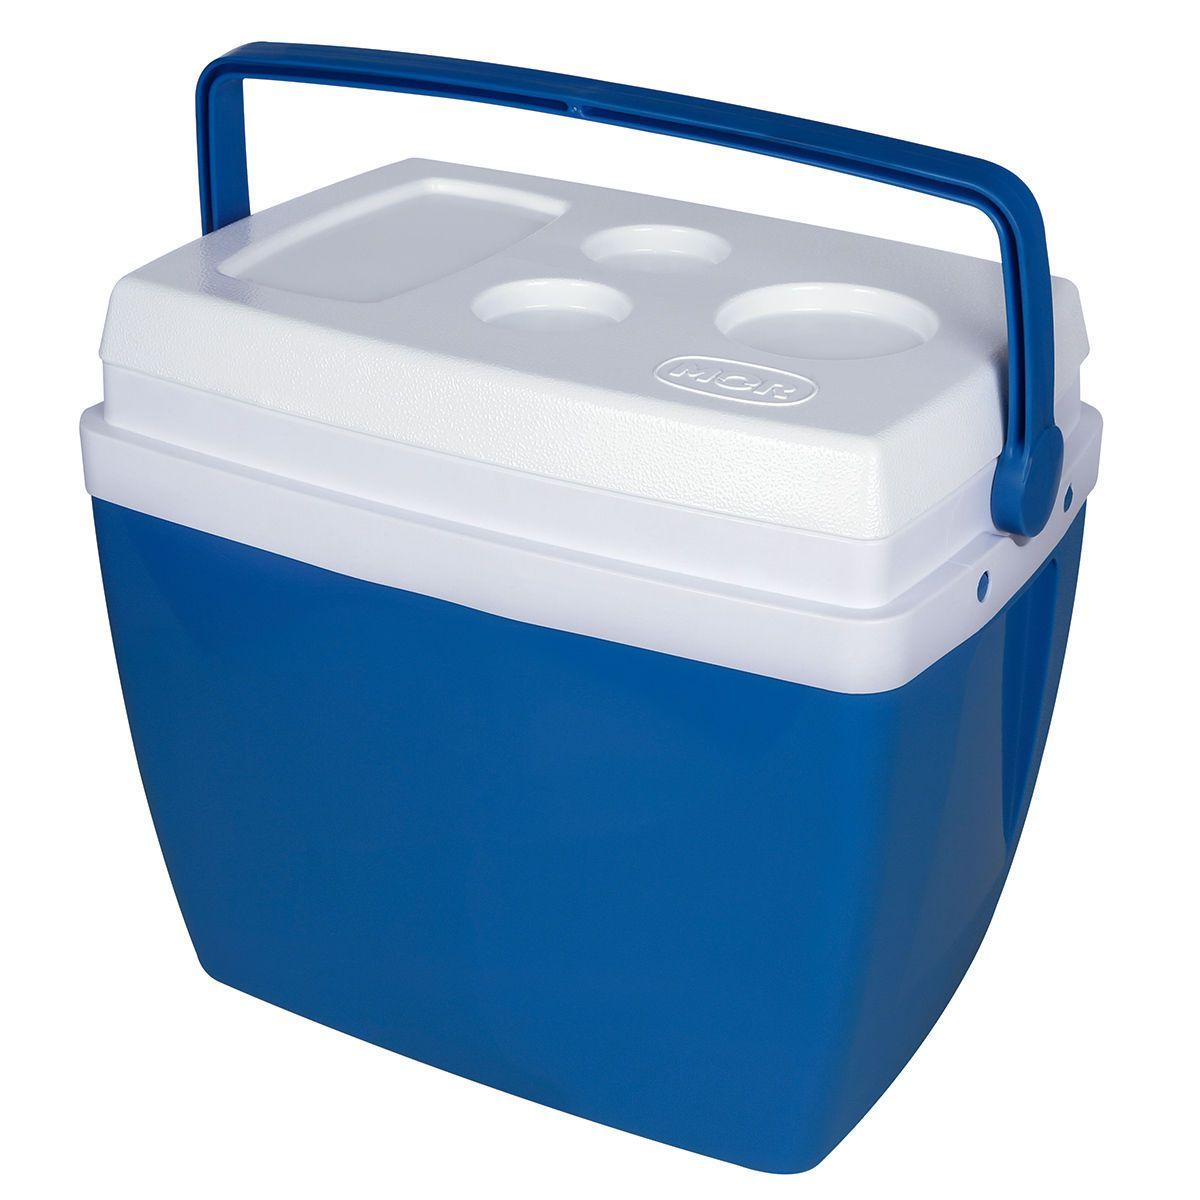 Caixa Termica Cooler 34 Litros Azul Mor